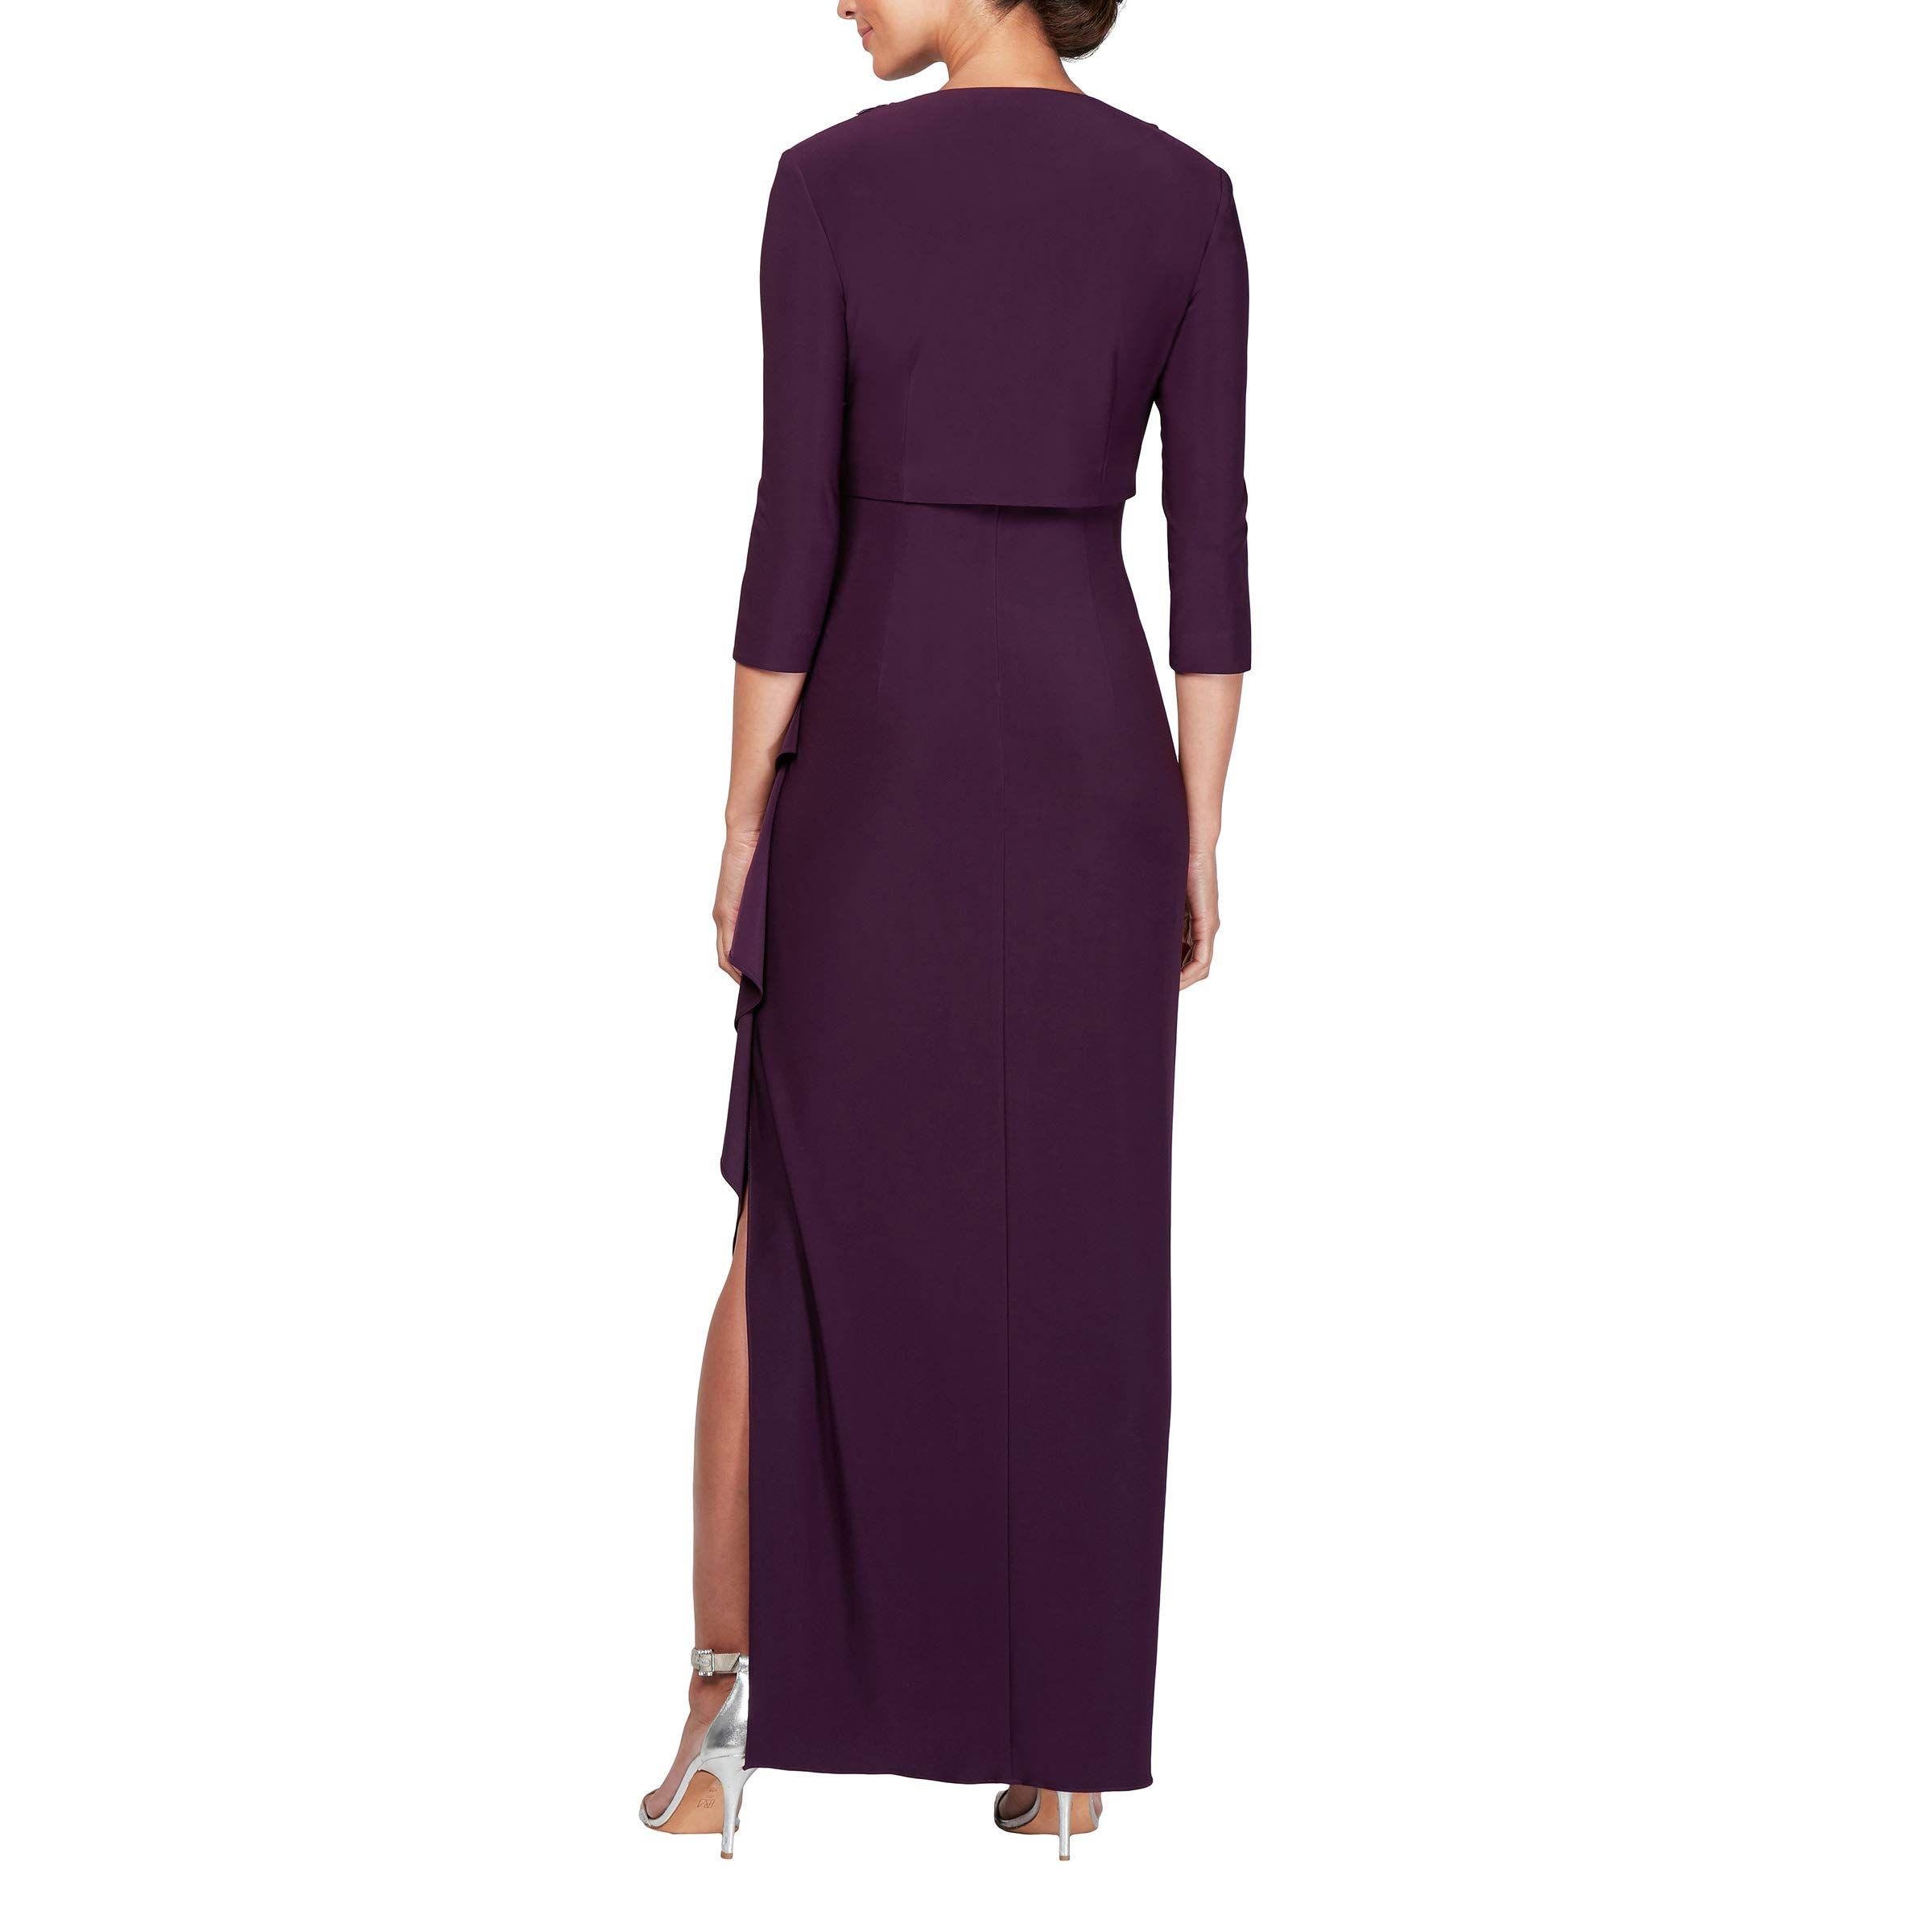 Petite and Regular Sizes Alex Evenings Womens Empire Waist Bolero Jacket Dress